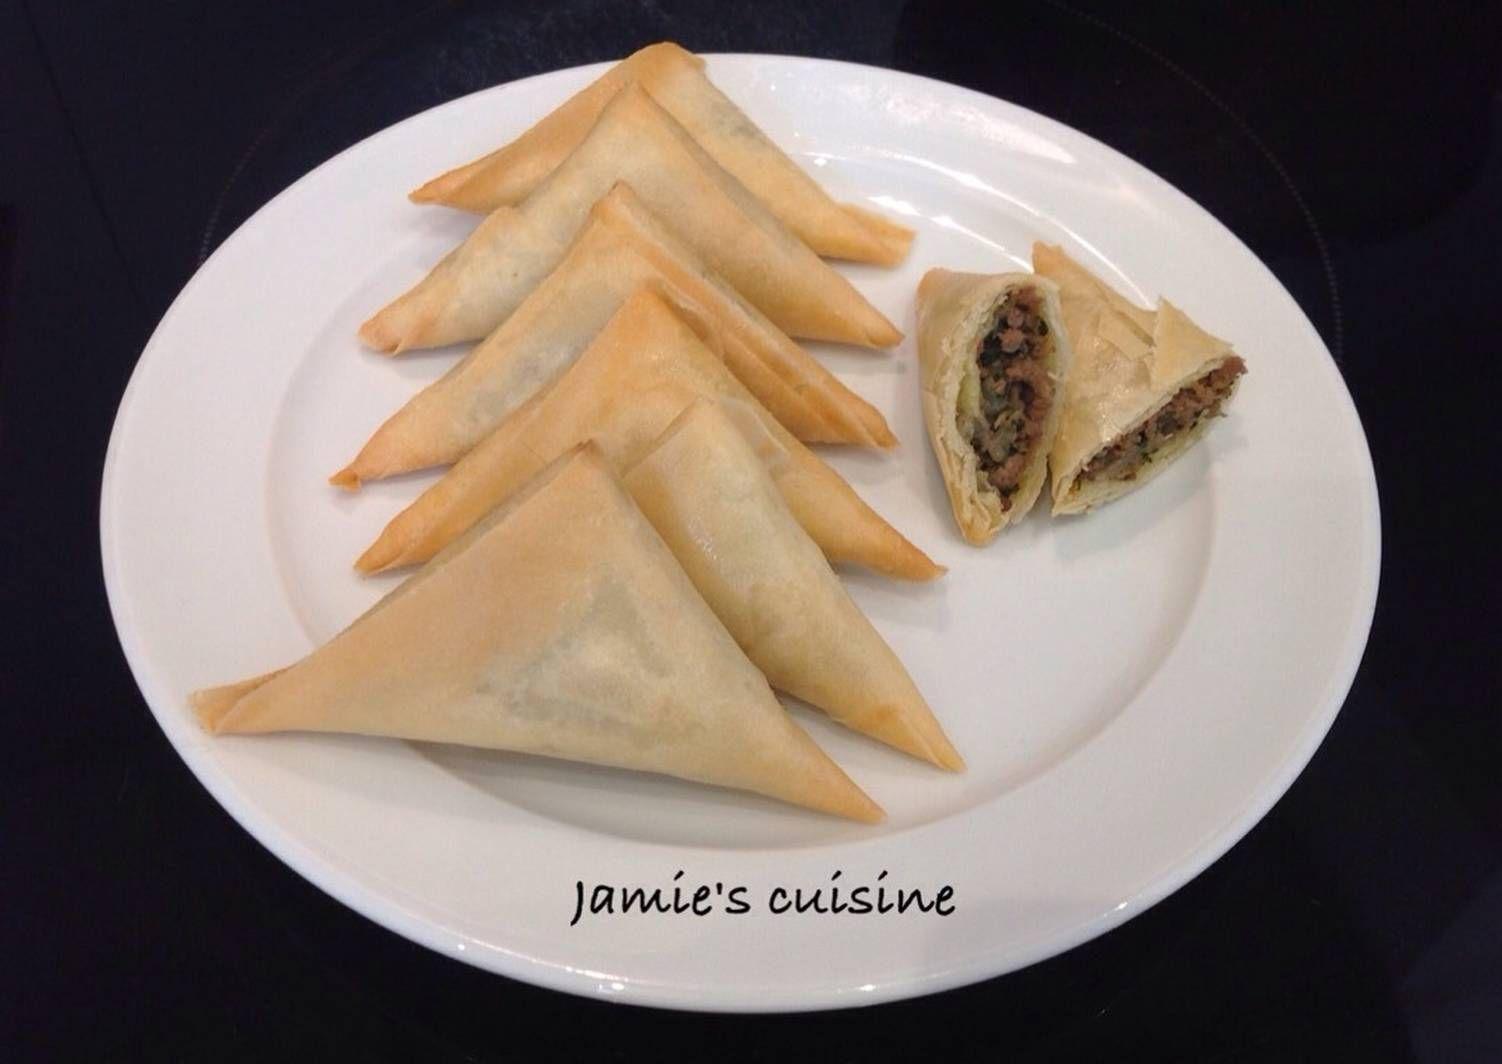 Resep Samosa Daging Sapi Oleh Jamie S Cuisine Resep Di 2020 Daging Sapi Samosa Sapi